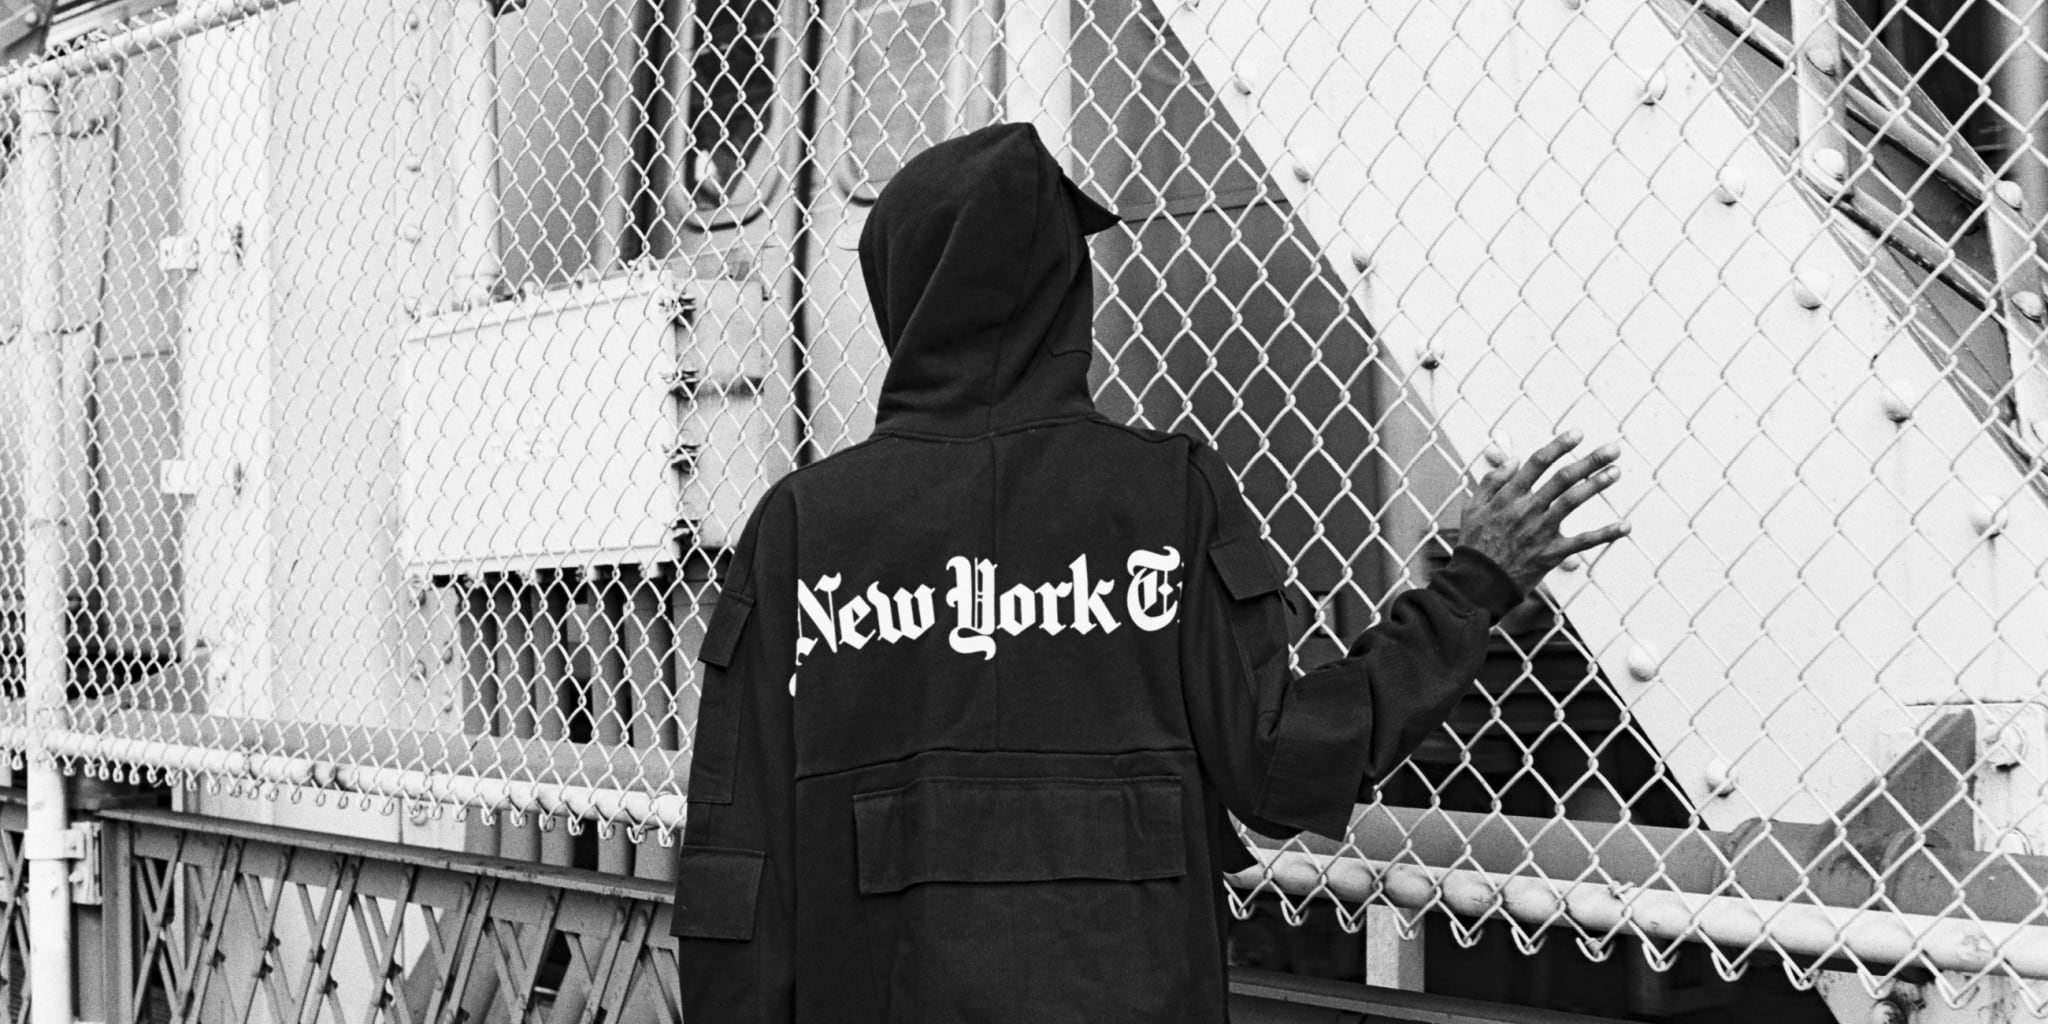 Études x The New York Times Collaboration